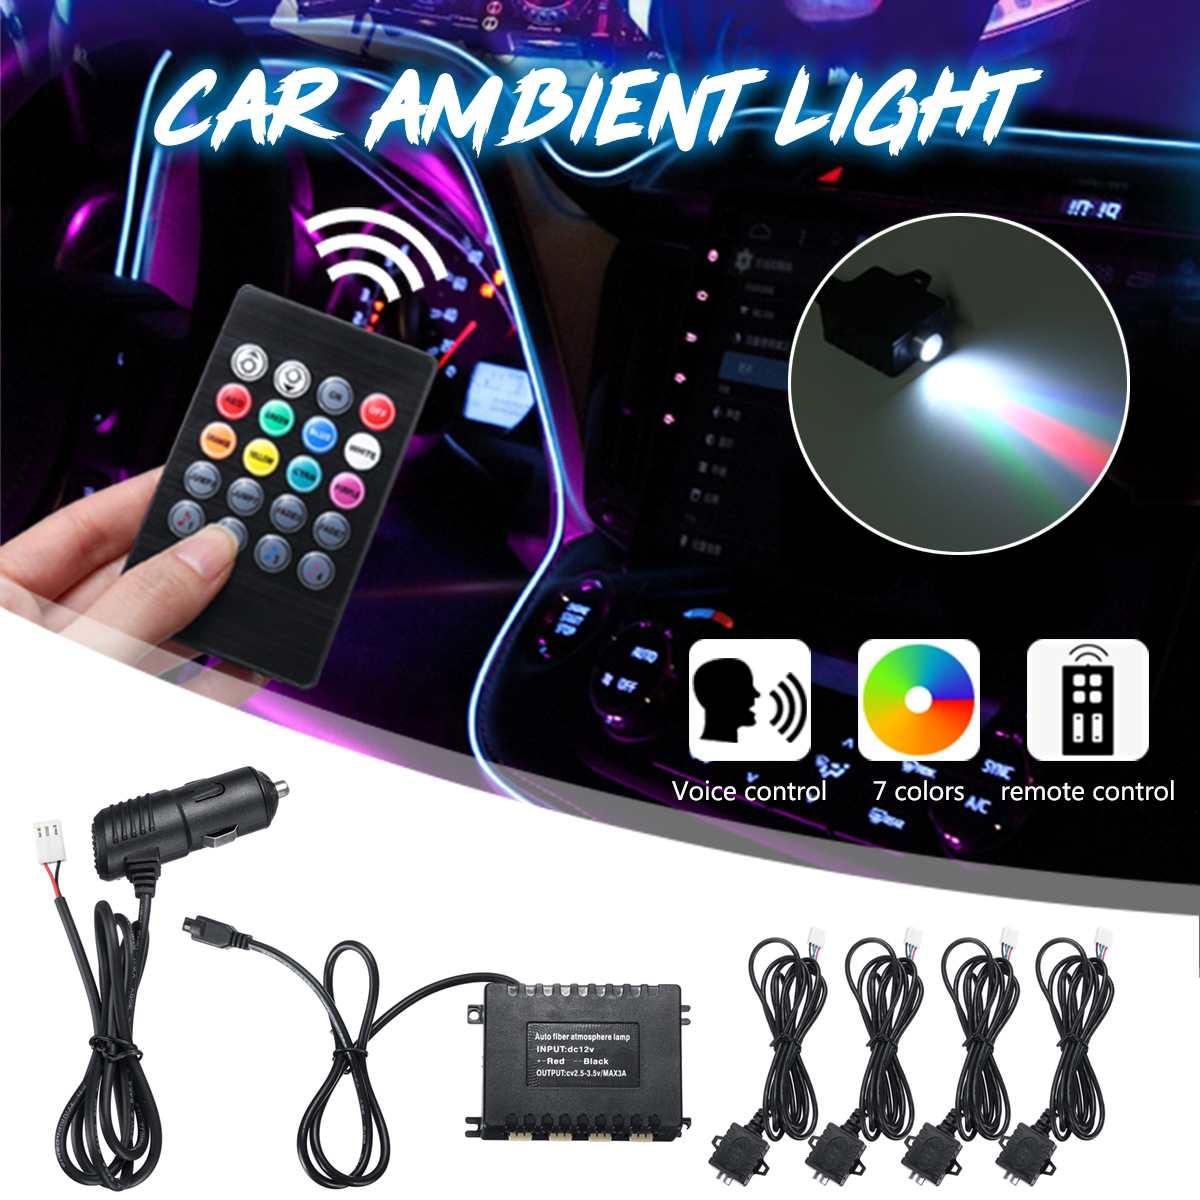 Car Light RGB Ambient Lamp 12V Fiber Optic LED Light Voice/Remote Control Interior Decorative Atmosphere Lamp Auto Accessories